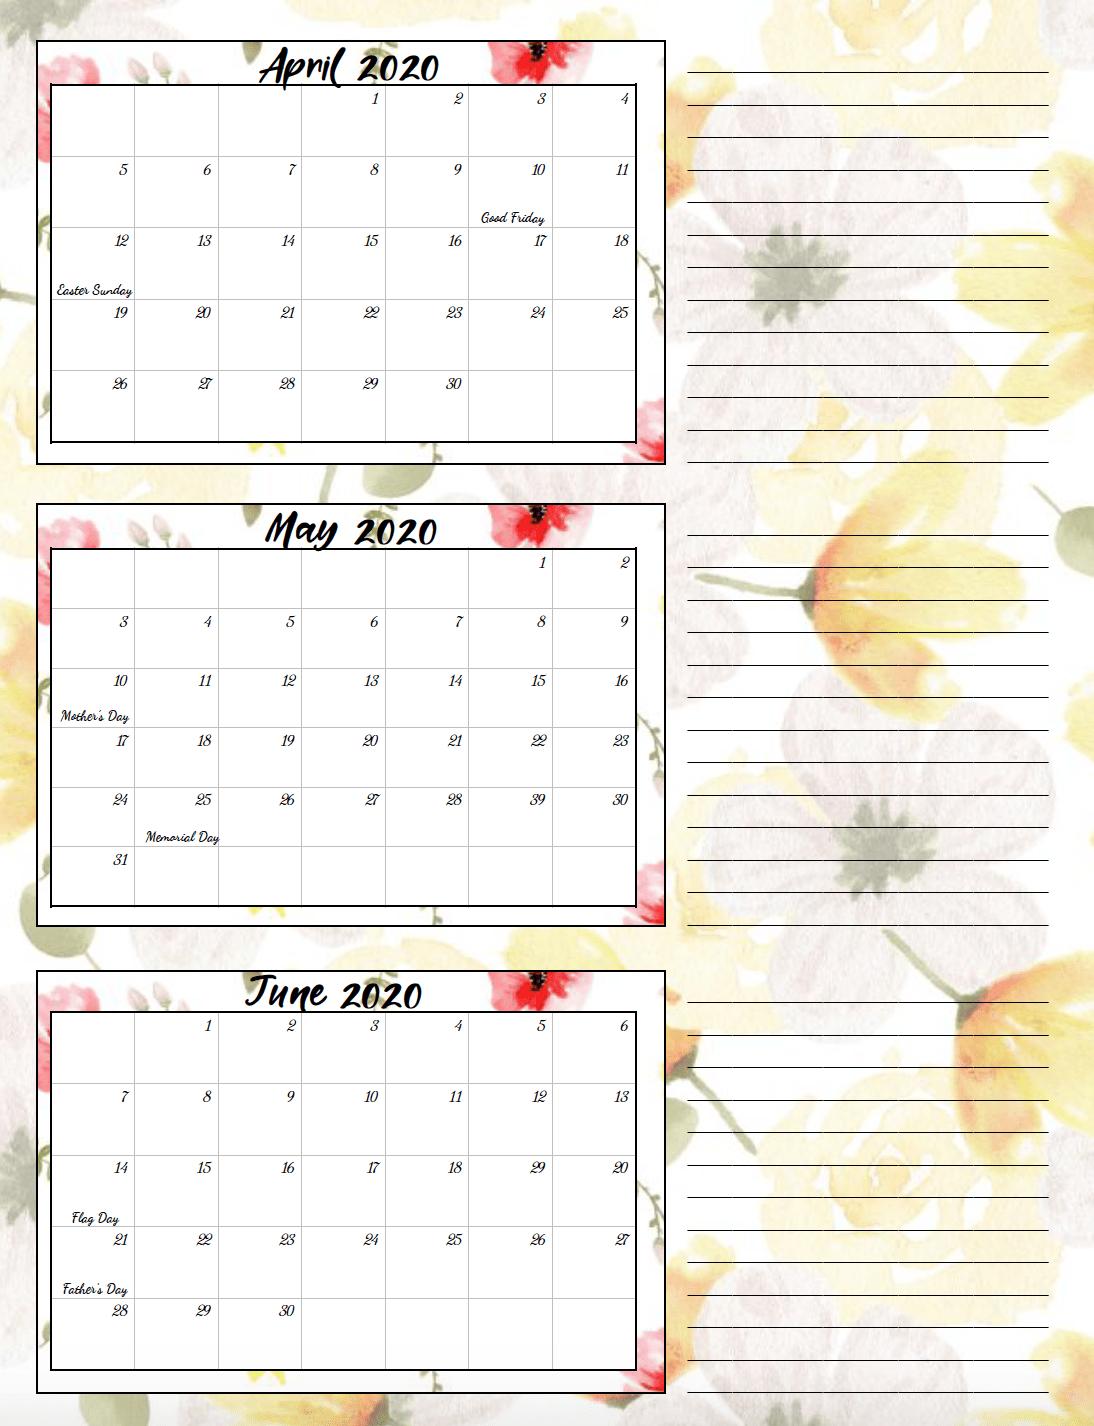 Free Printable 2020 Quarterly Calendars With Holidays: 3 Designs